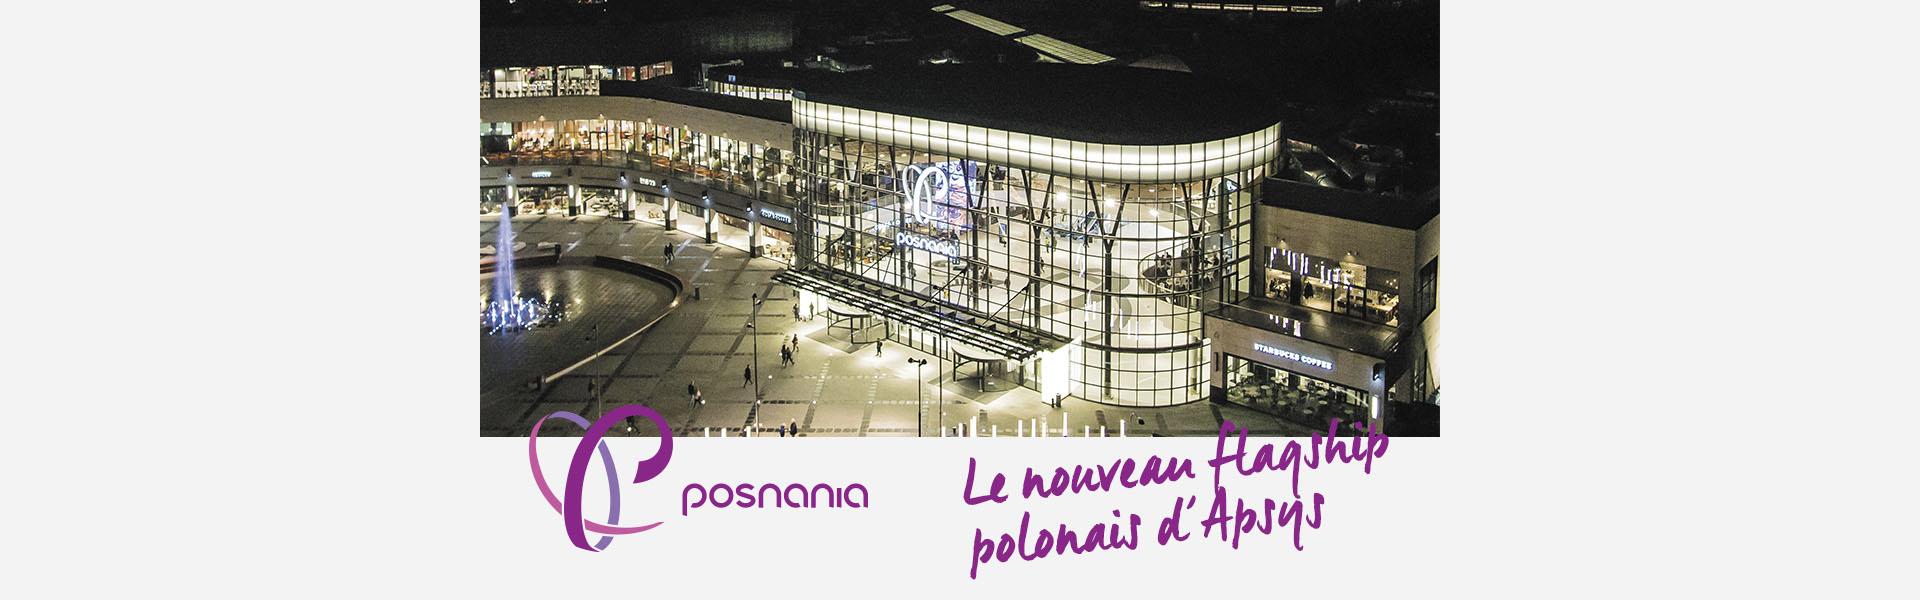 bannière3_Posnania